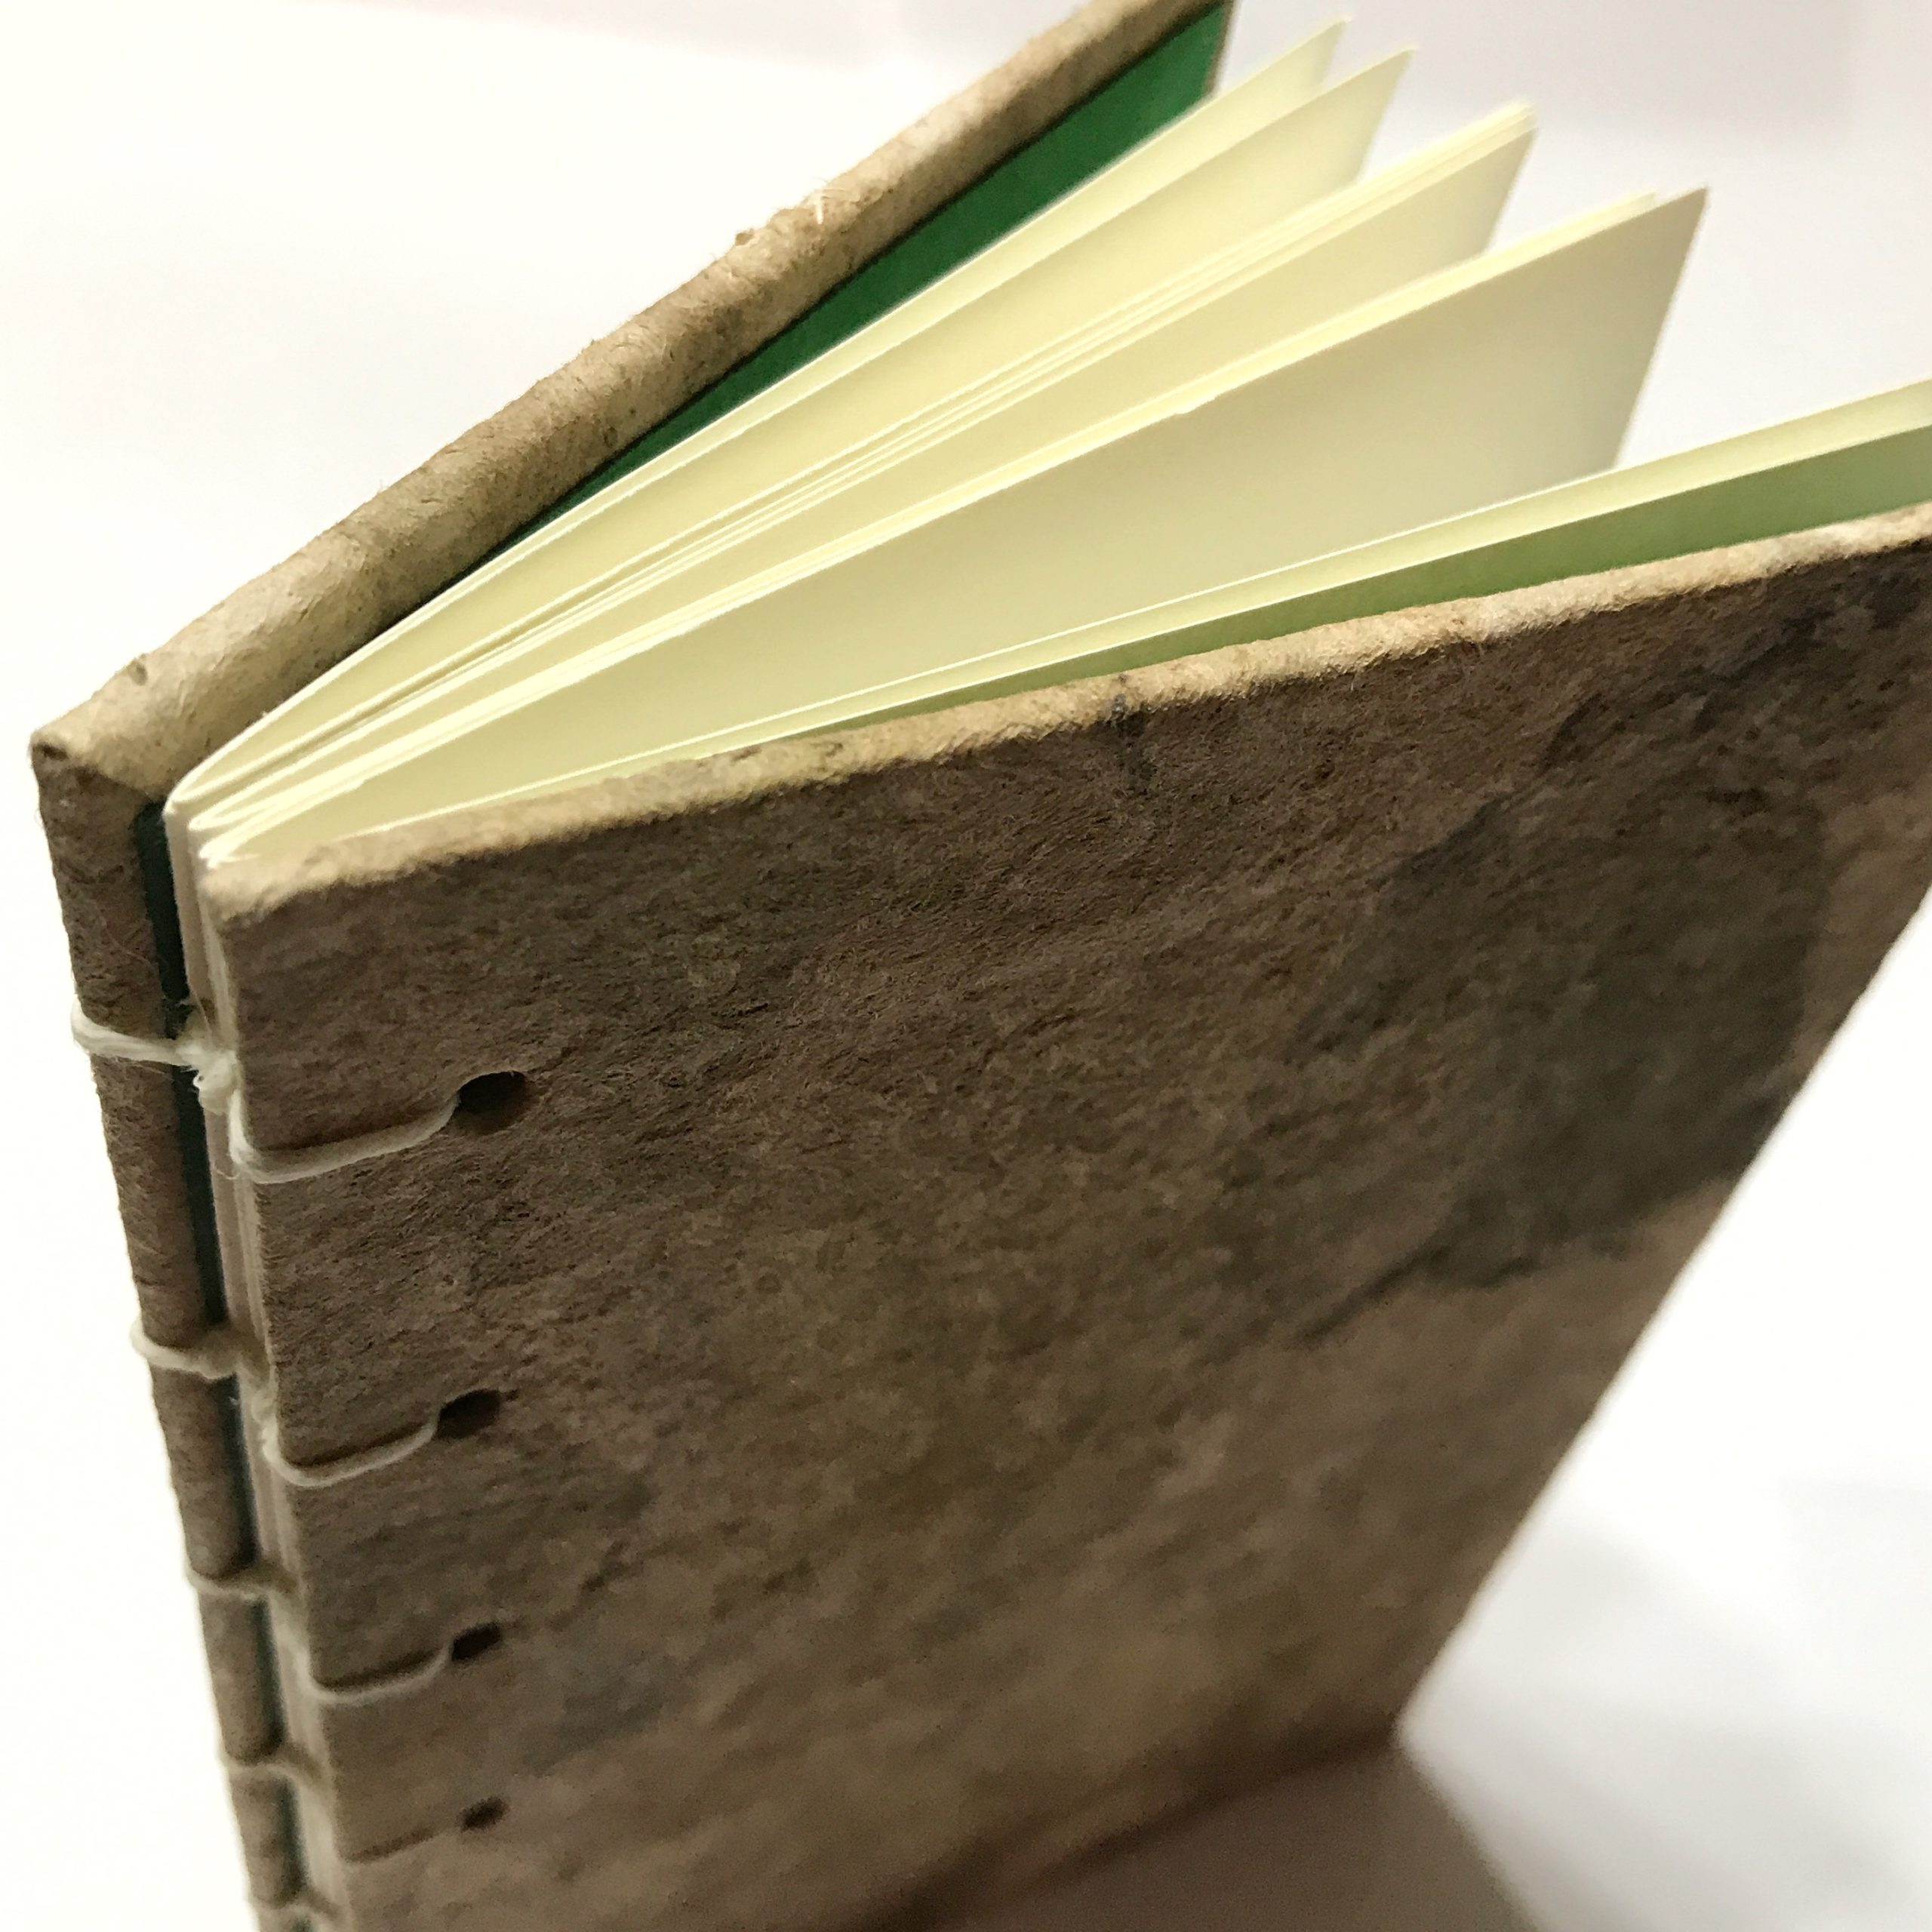 Top view of natural bark cover sketchbook